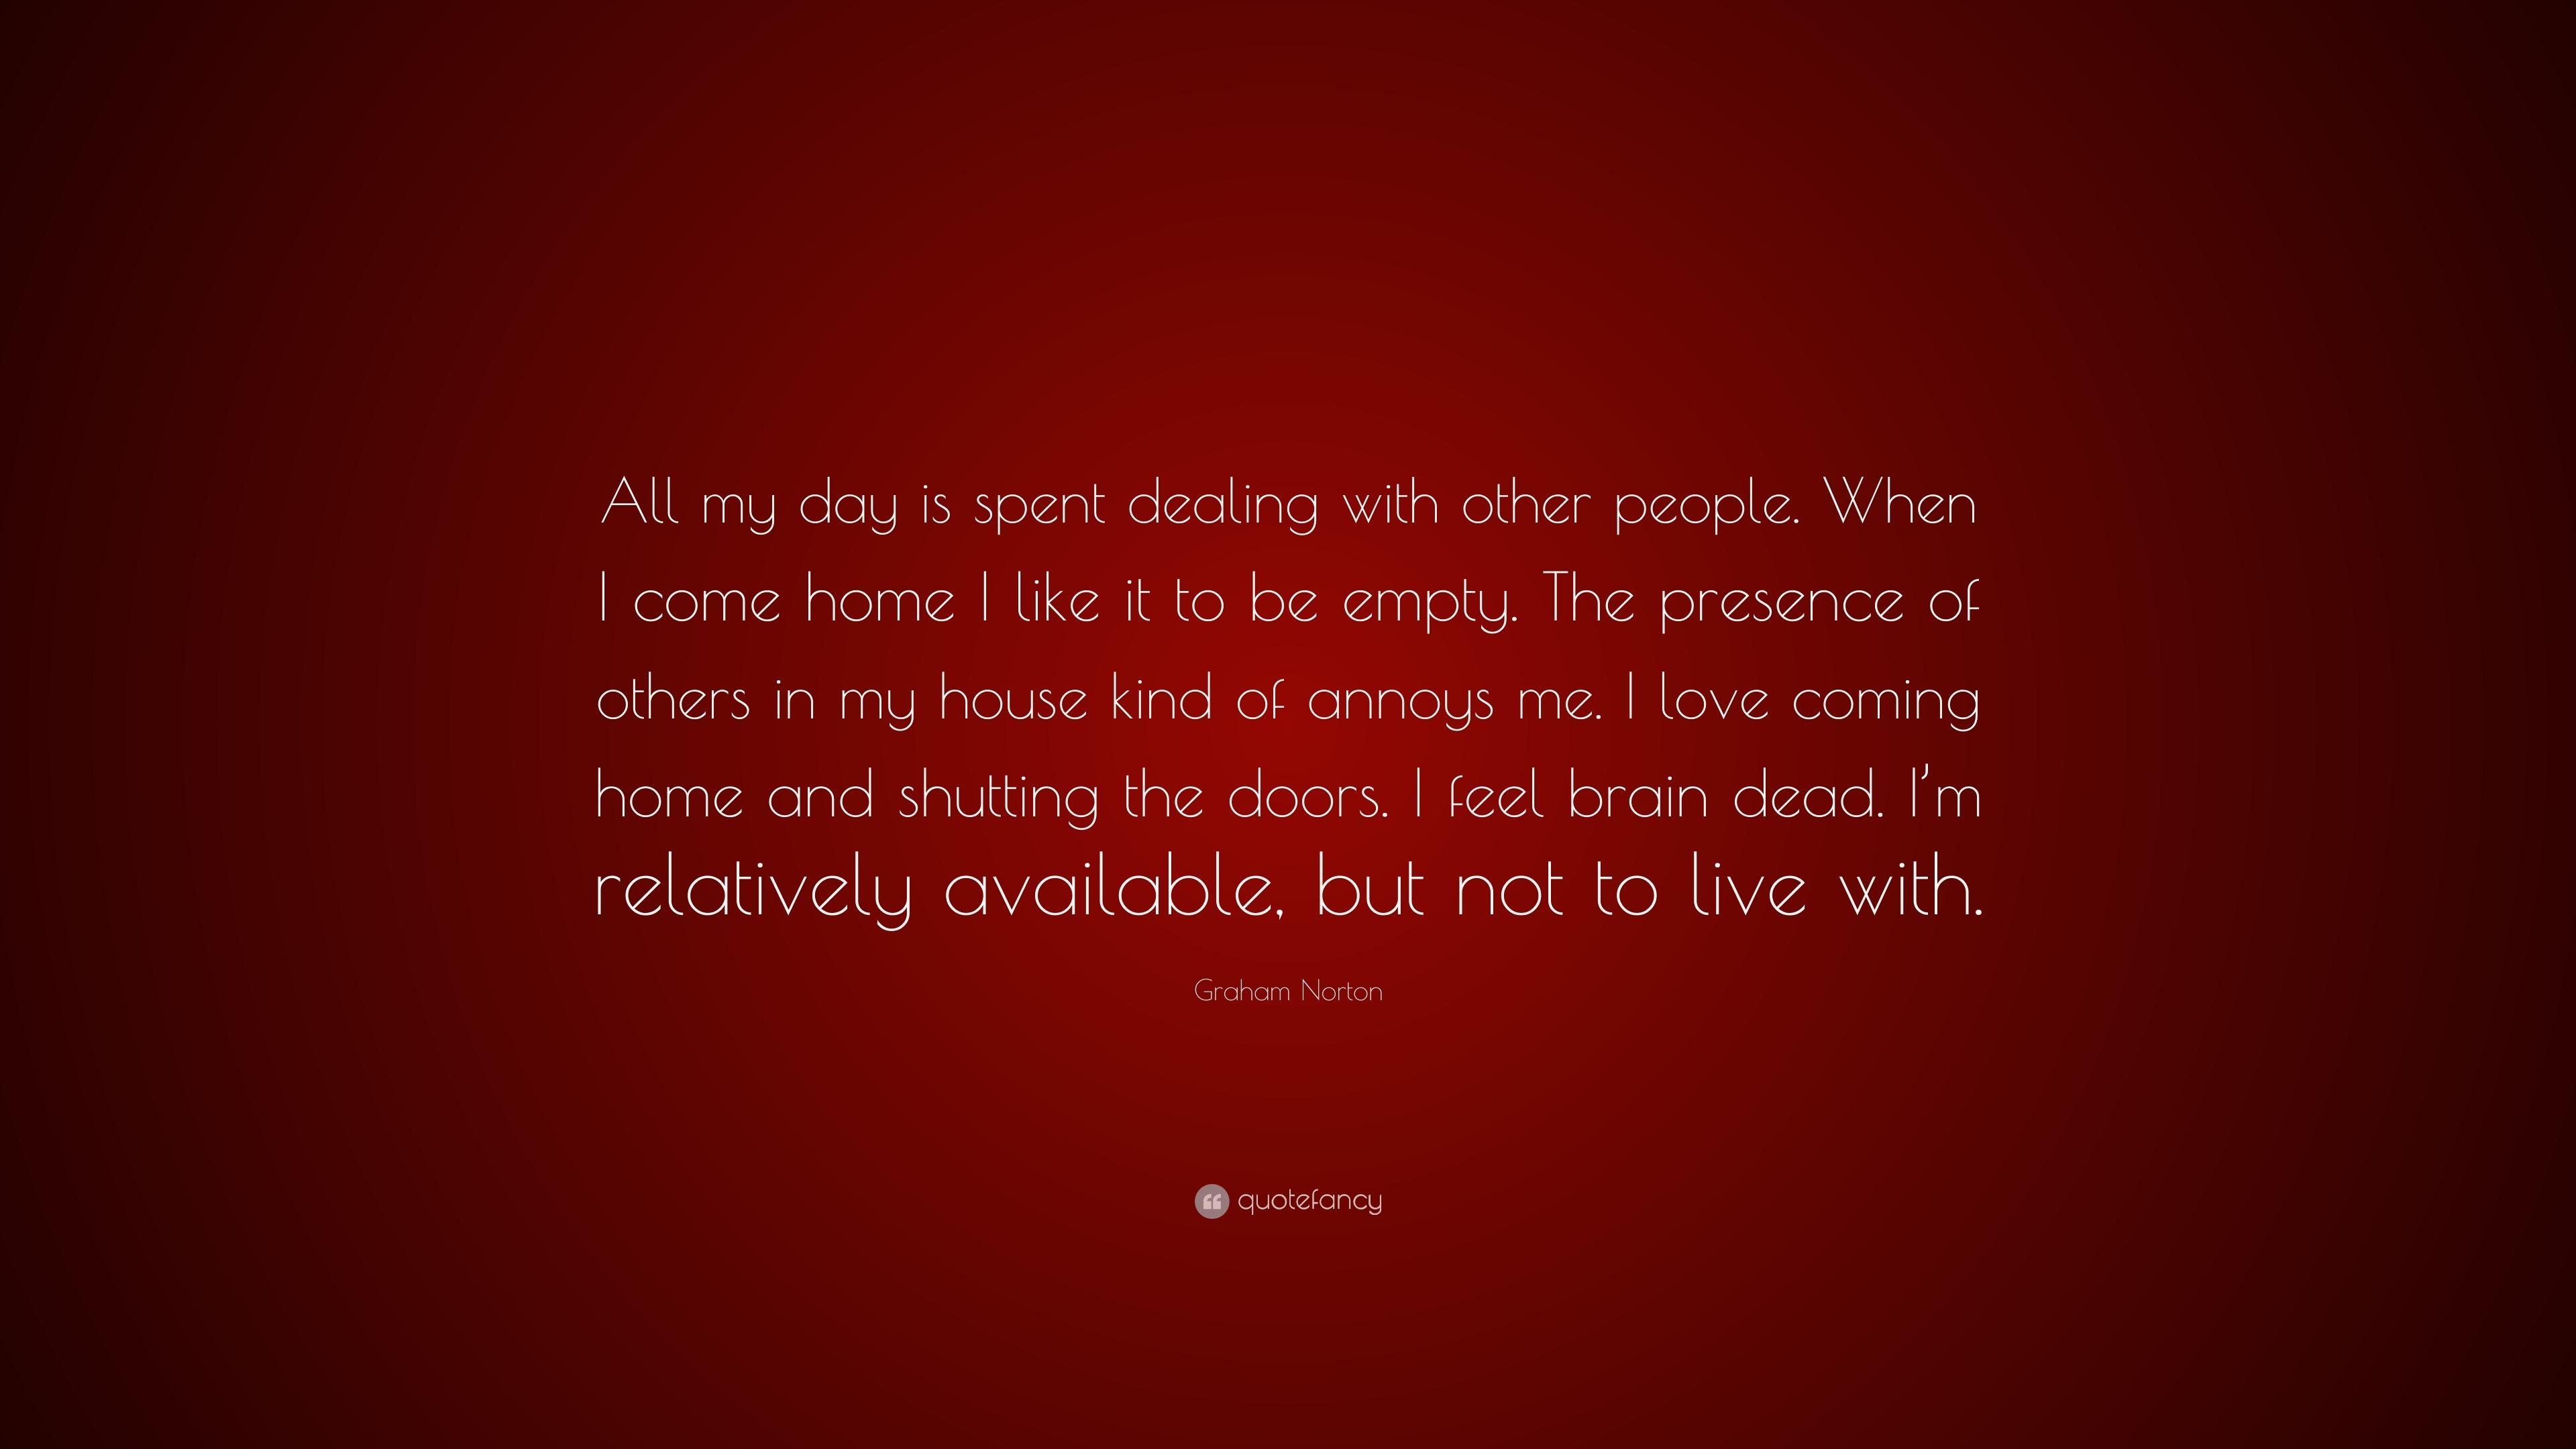 Graham Norton Quote u201cAll my day is spent dealing with other people. When & Graham Norton Quote: u201cAll my day is spent dealing with other people ...